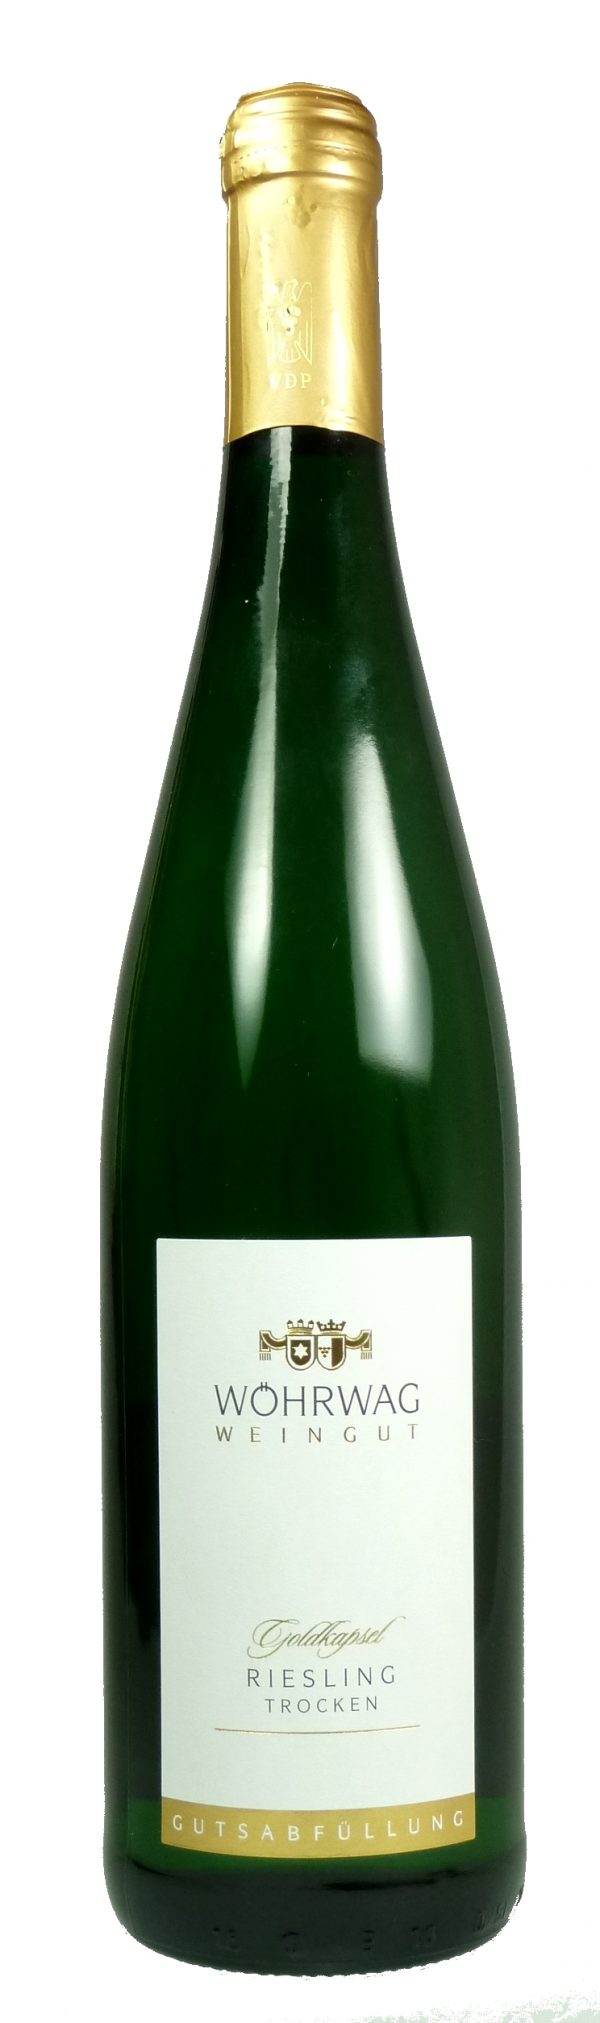 Untertürkheimer Herzogenberg Riesling Goldkapsel Qualitätswein trocken 2018